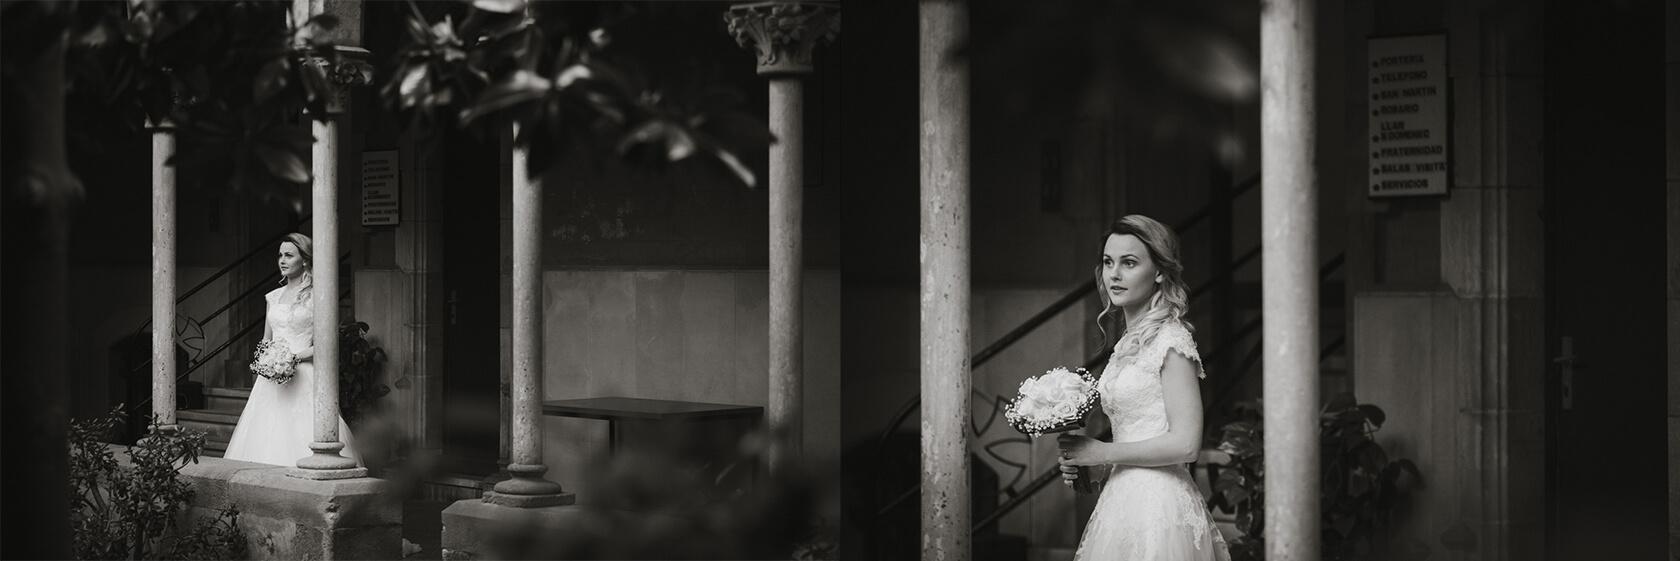 Barcelona-bryllup-fotograf